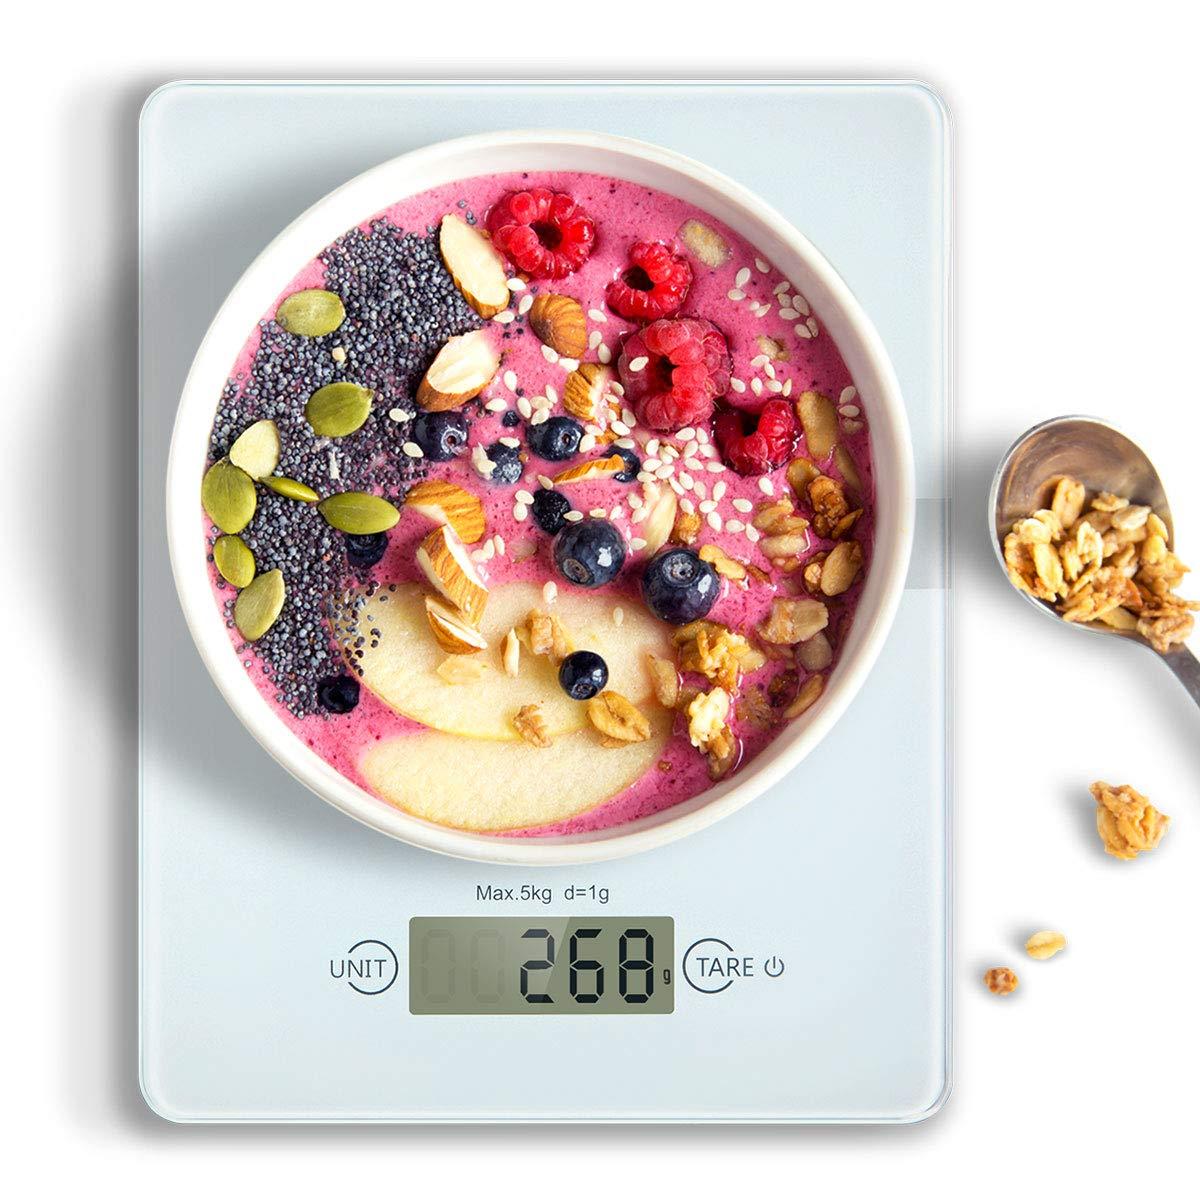 Báscula Digital de Cocina, HAMSWAN Balanza de Alimentos Multifuncional en Vidrio Templado, Báscula Electrónica para Cocinar, 5kg / 11 lbs Fácil de Limpiar Incluyendo Pila de Botón, Smart Weigh Ultradelgada, Peso de Cocina